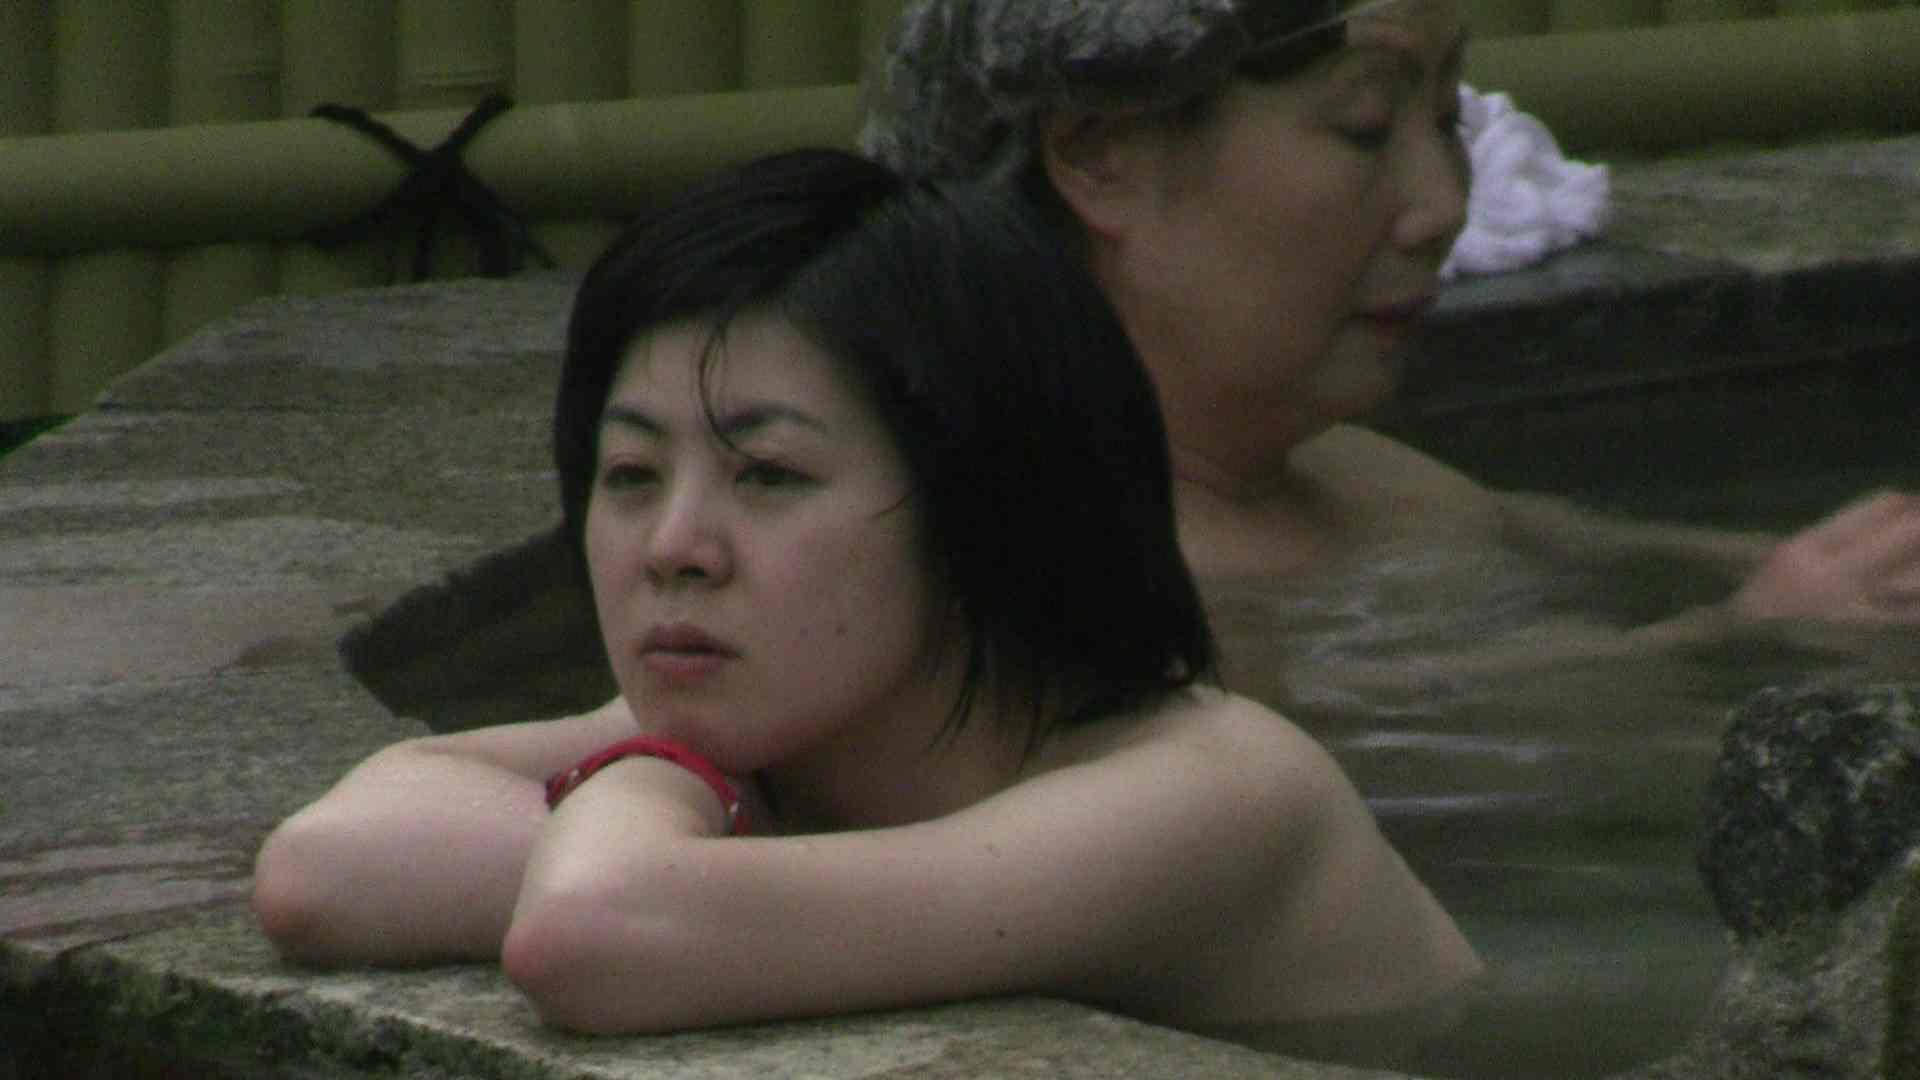 Aquaな露天風呂Vol.685 露天 オメコ無修正動画無料 13pic 8